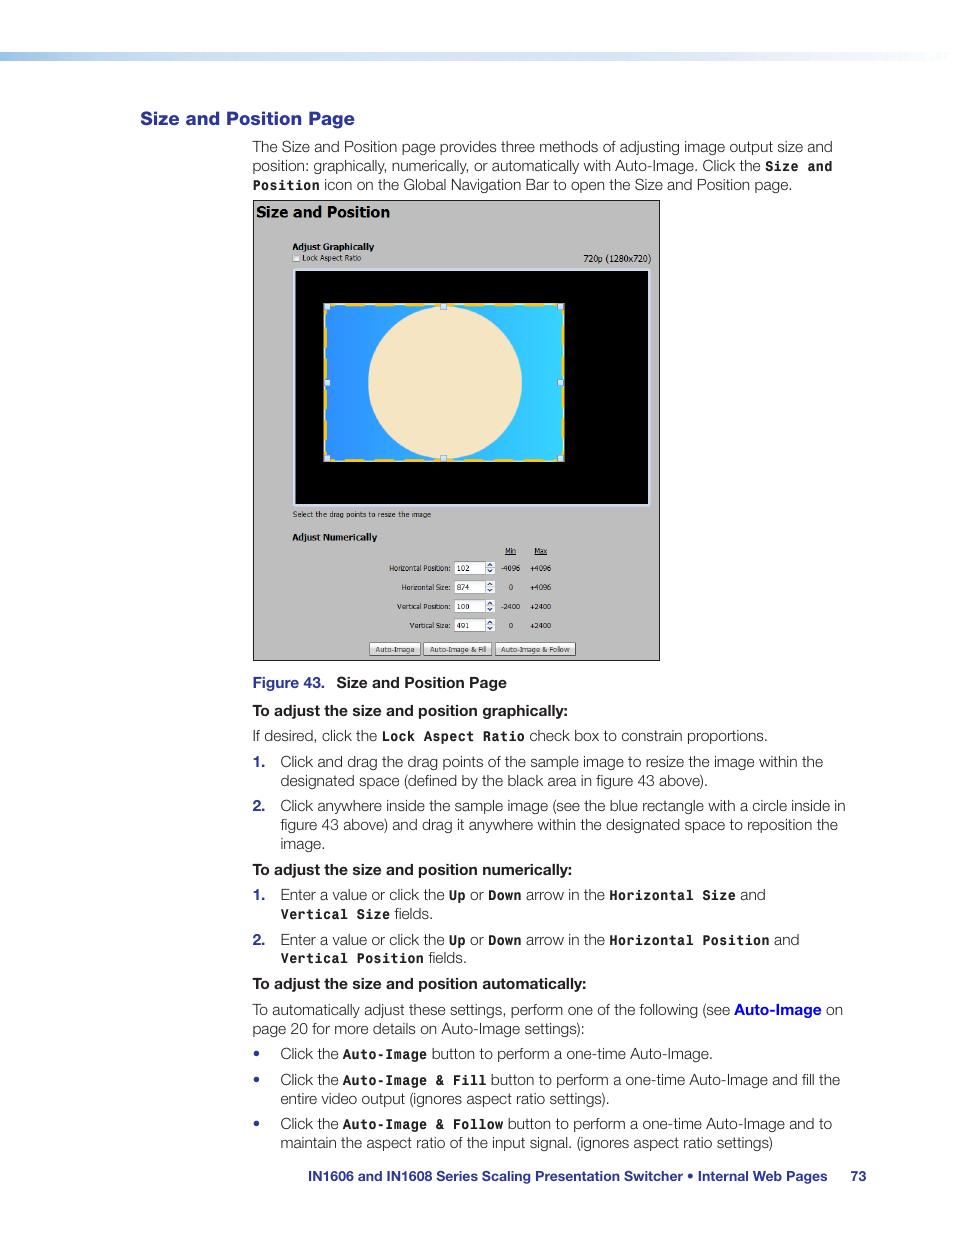 extron electronics in1608 ma user guide user manual page 79 109 rh manualsdir com Paperwork Guide VeriFone Vx570 Manual Guide